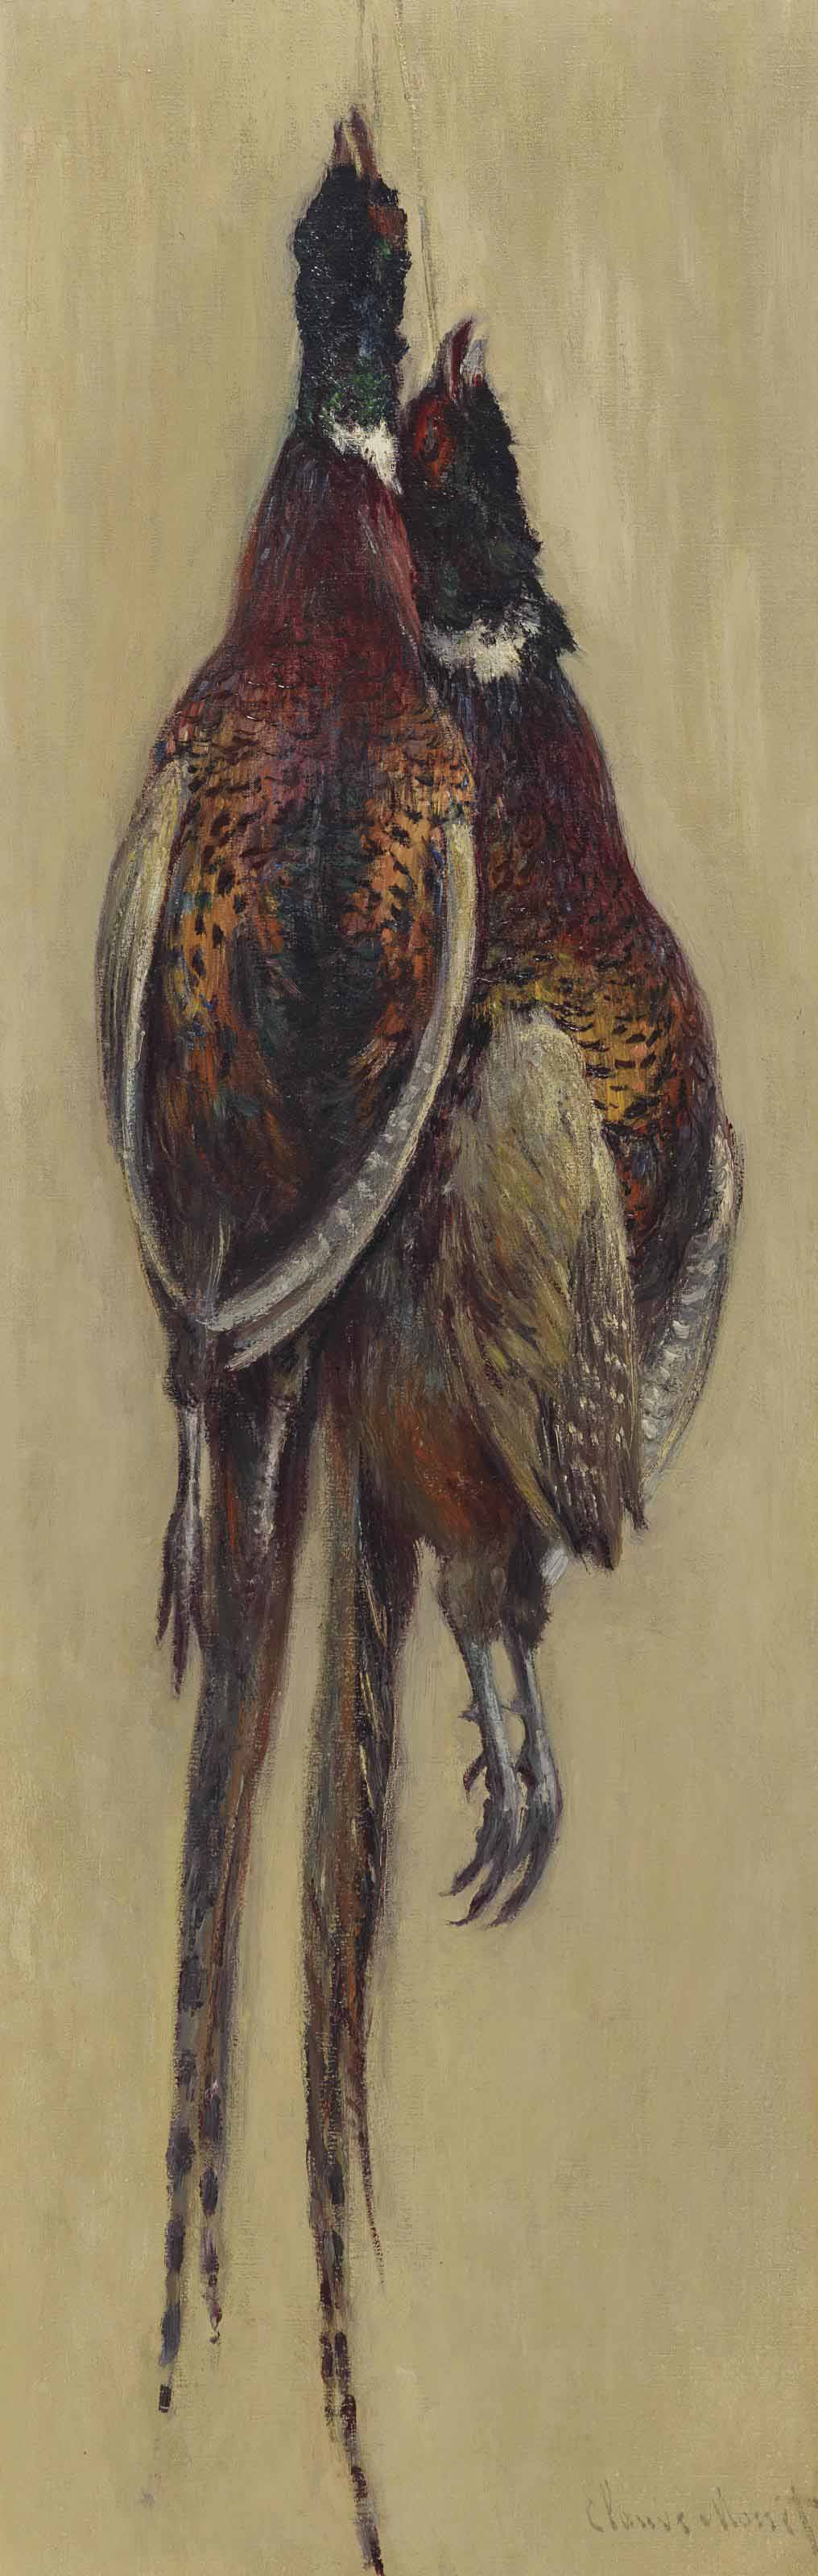 Claude Monet (1840-1926) | Faisans suspendus | 19th Century, Paintings |  Christie's